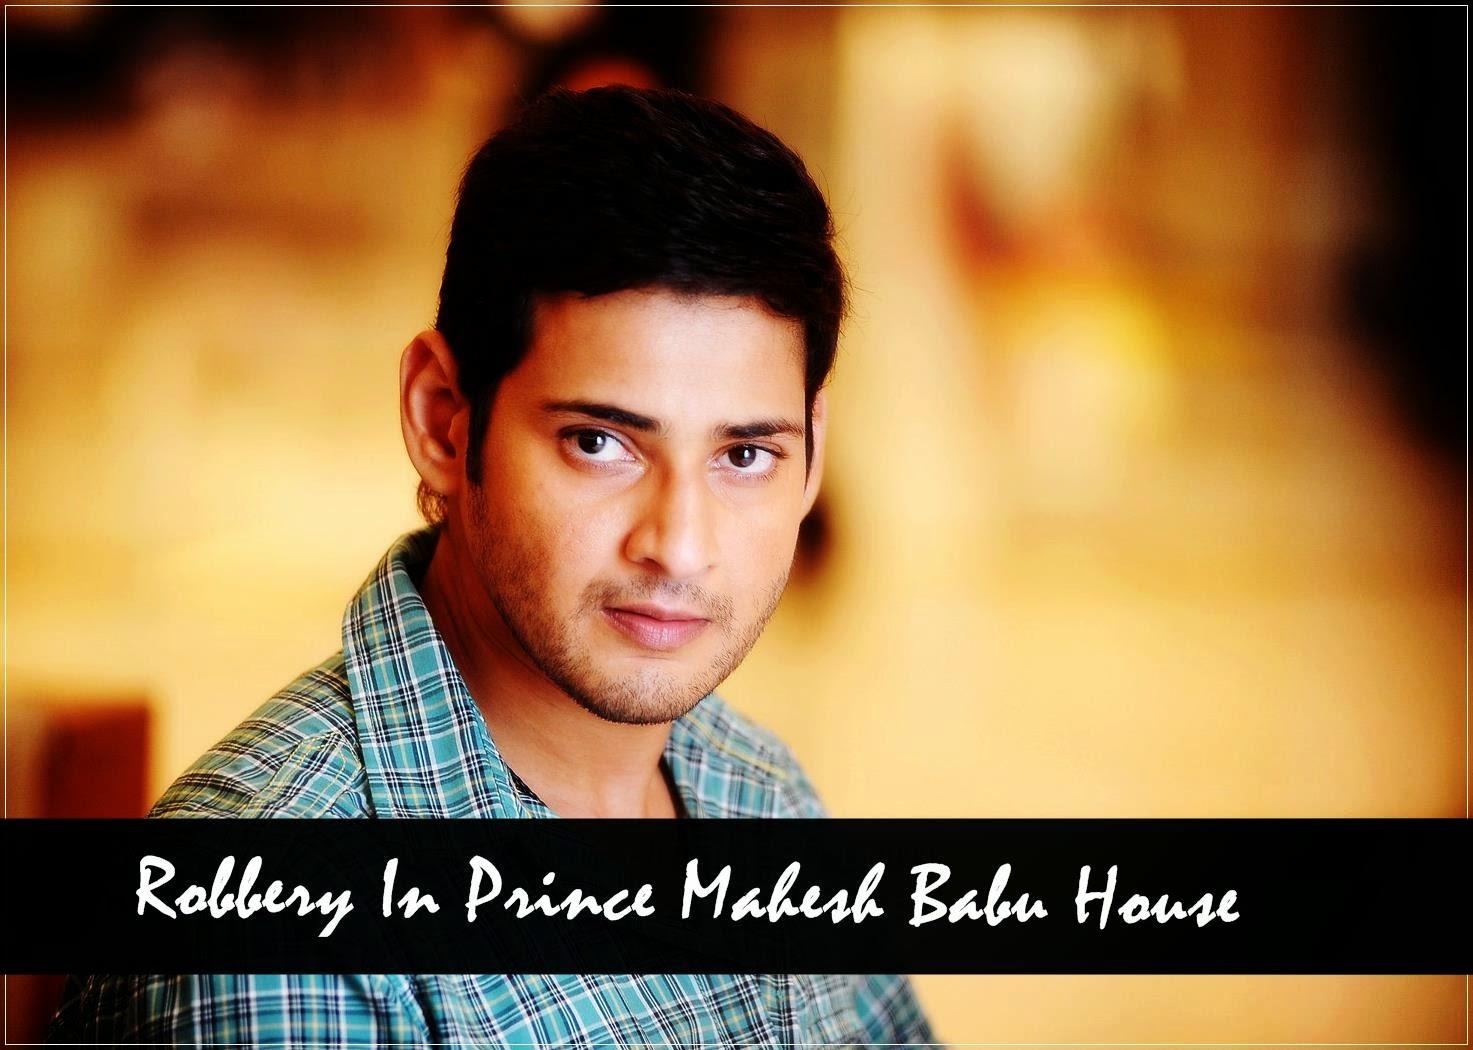 Prince Mahesh Babu New House Robbery in Prince Mahesh Babu